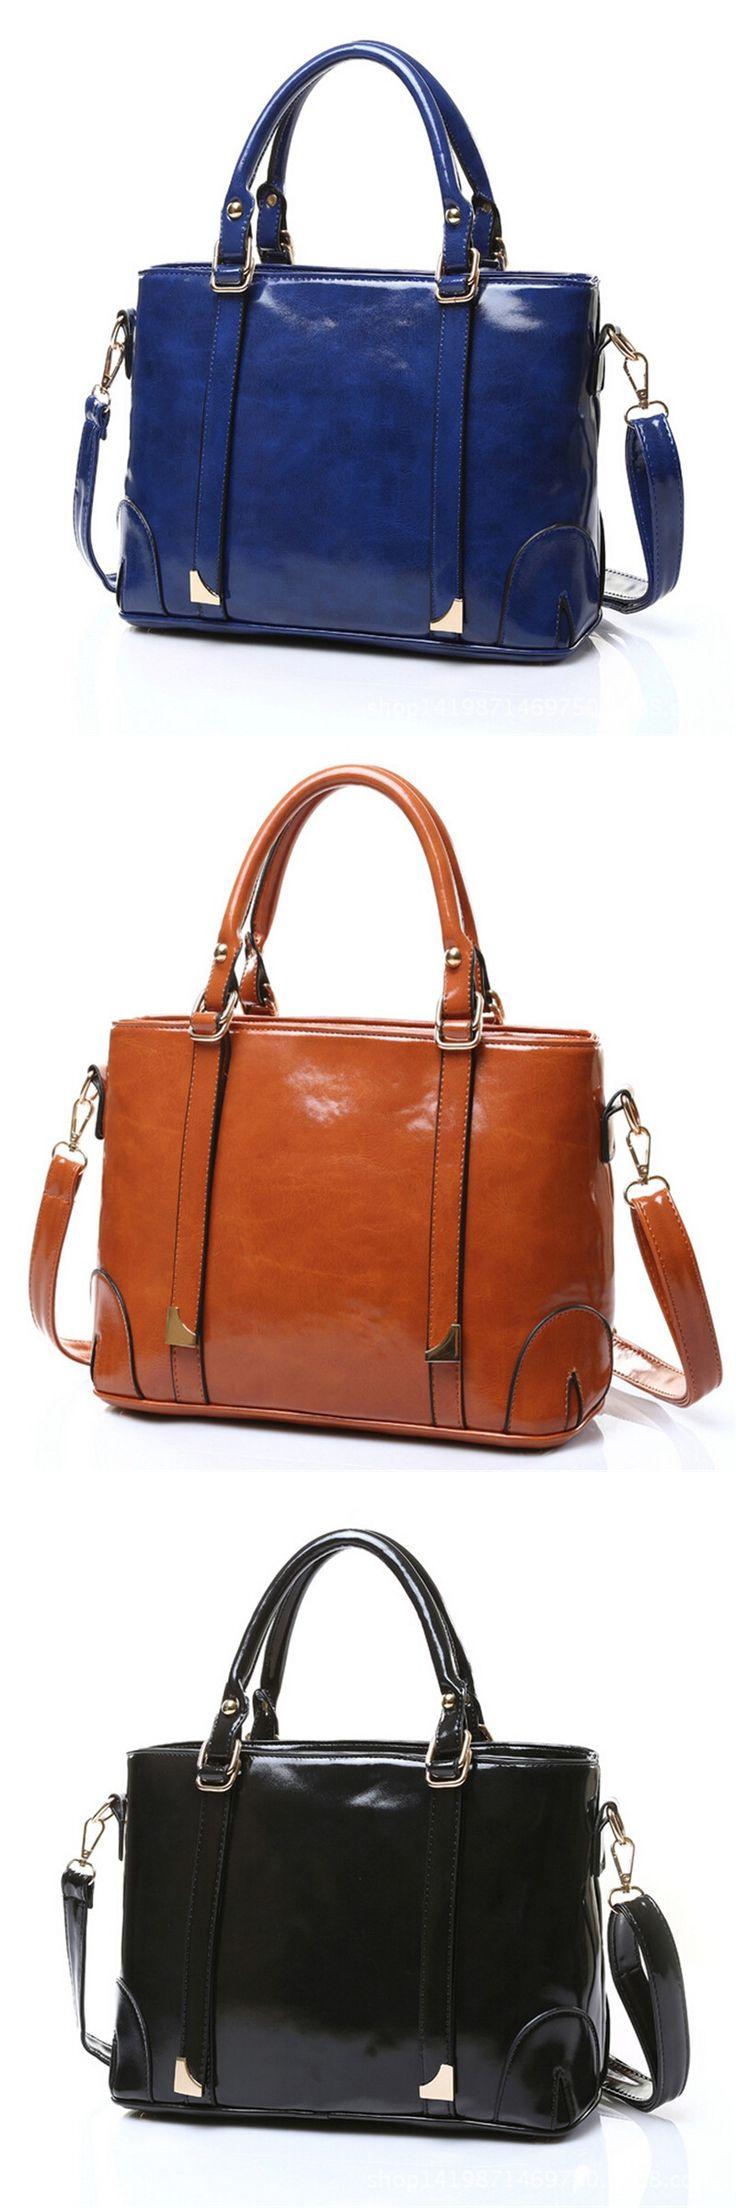 new fashion handbags wholesale handbags Korean version of the big oil skin bag messenger bag a generation of fat 5 color options